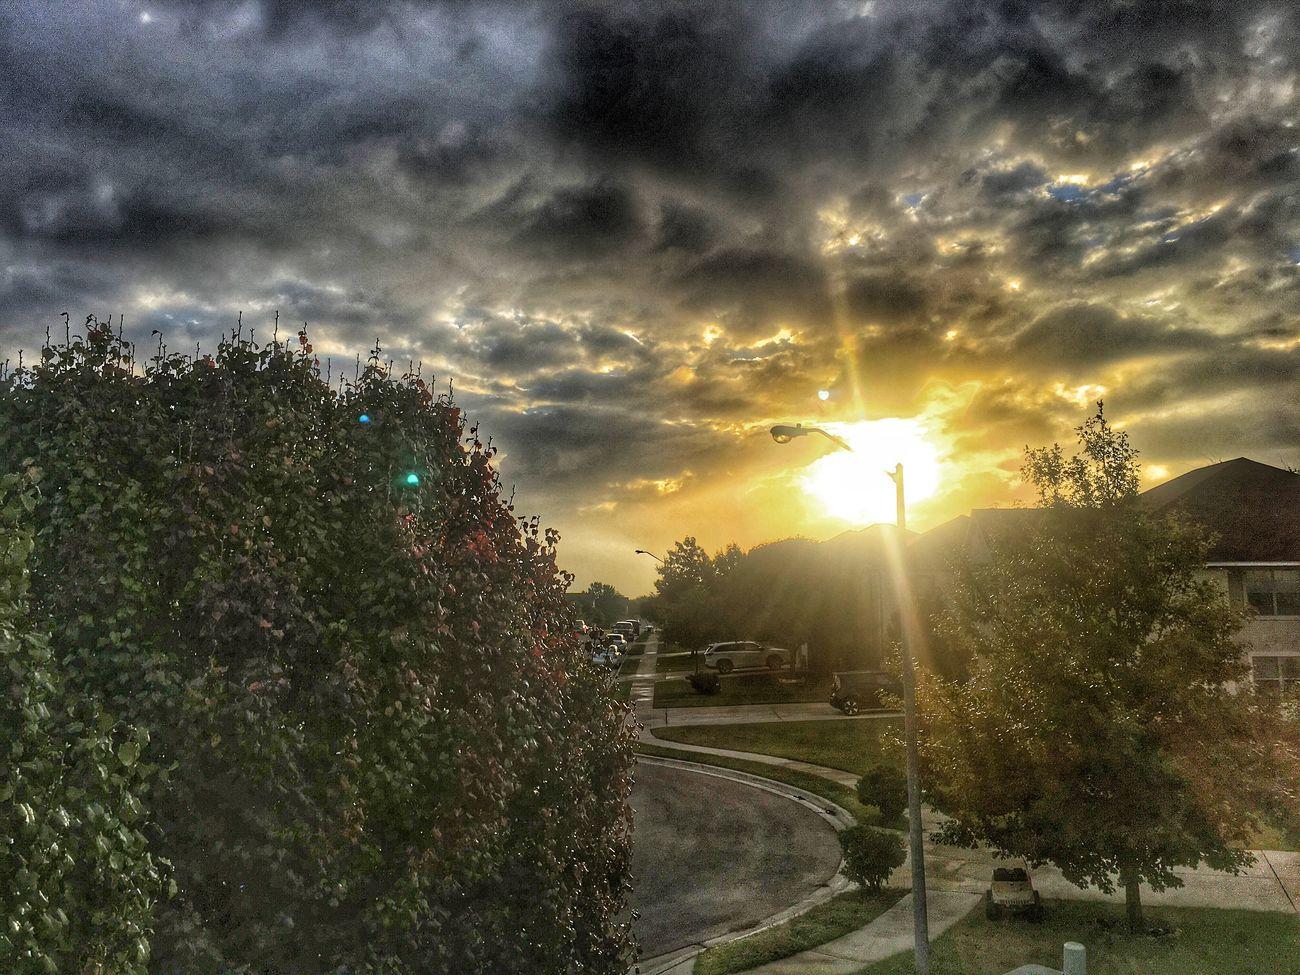 Centraltexas EyeEmTexas Check This Out Texas Weather Taking Photos Templetx